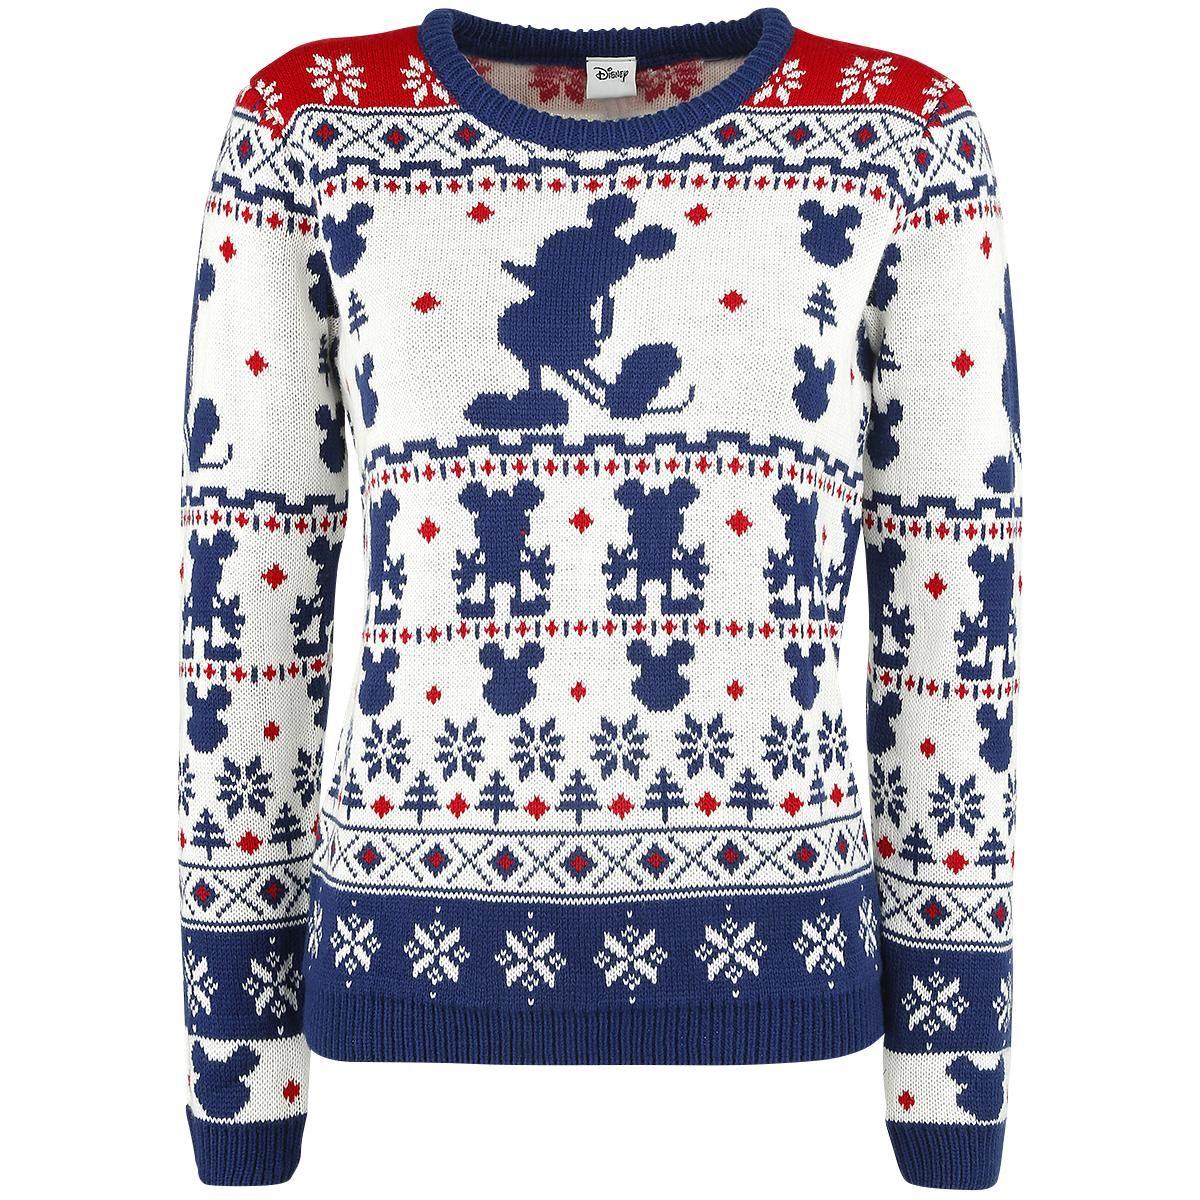 Disney Kersttrui.Christmas Sweater Knit Jumper By Mickey Christmas Pinterest